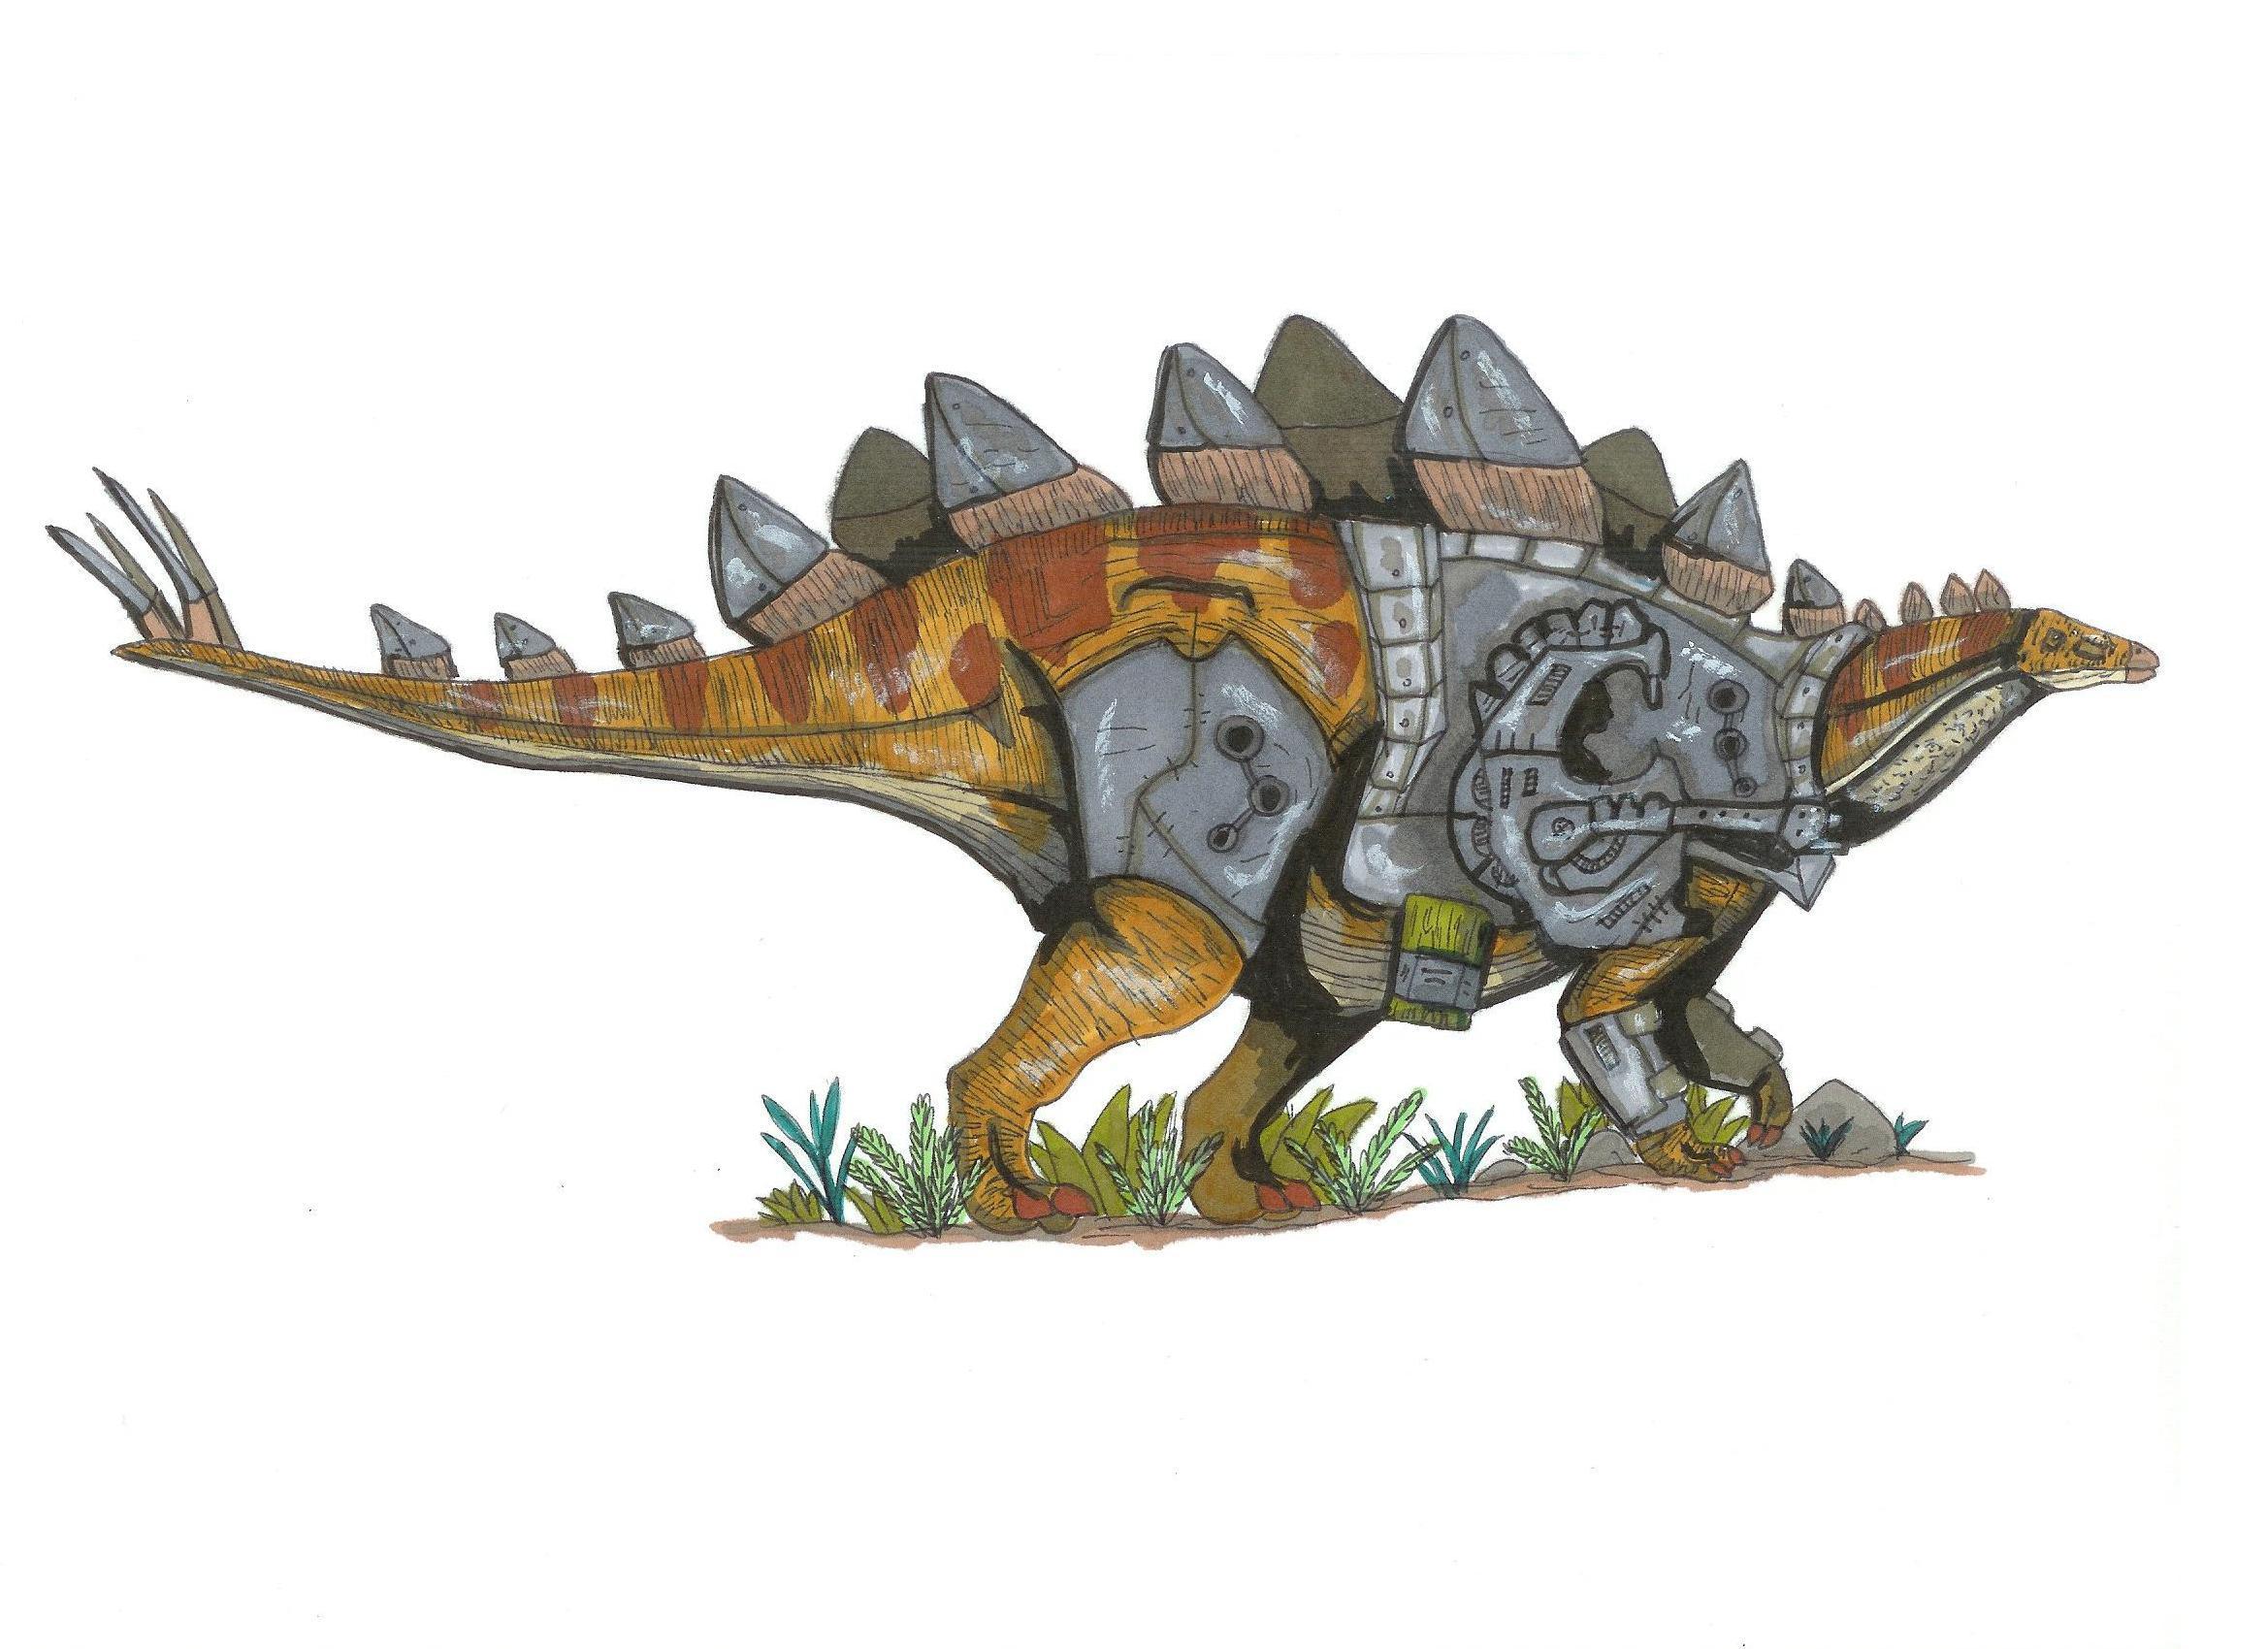 Who Will Win - Stegosaurus vs. Triceratops? - Bodybuilding.com Forums